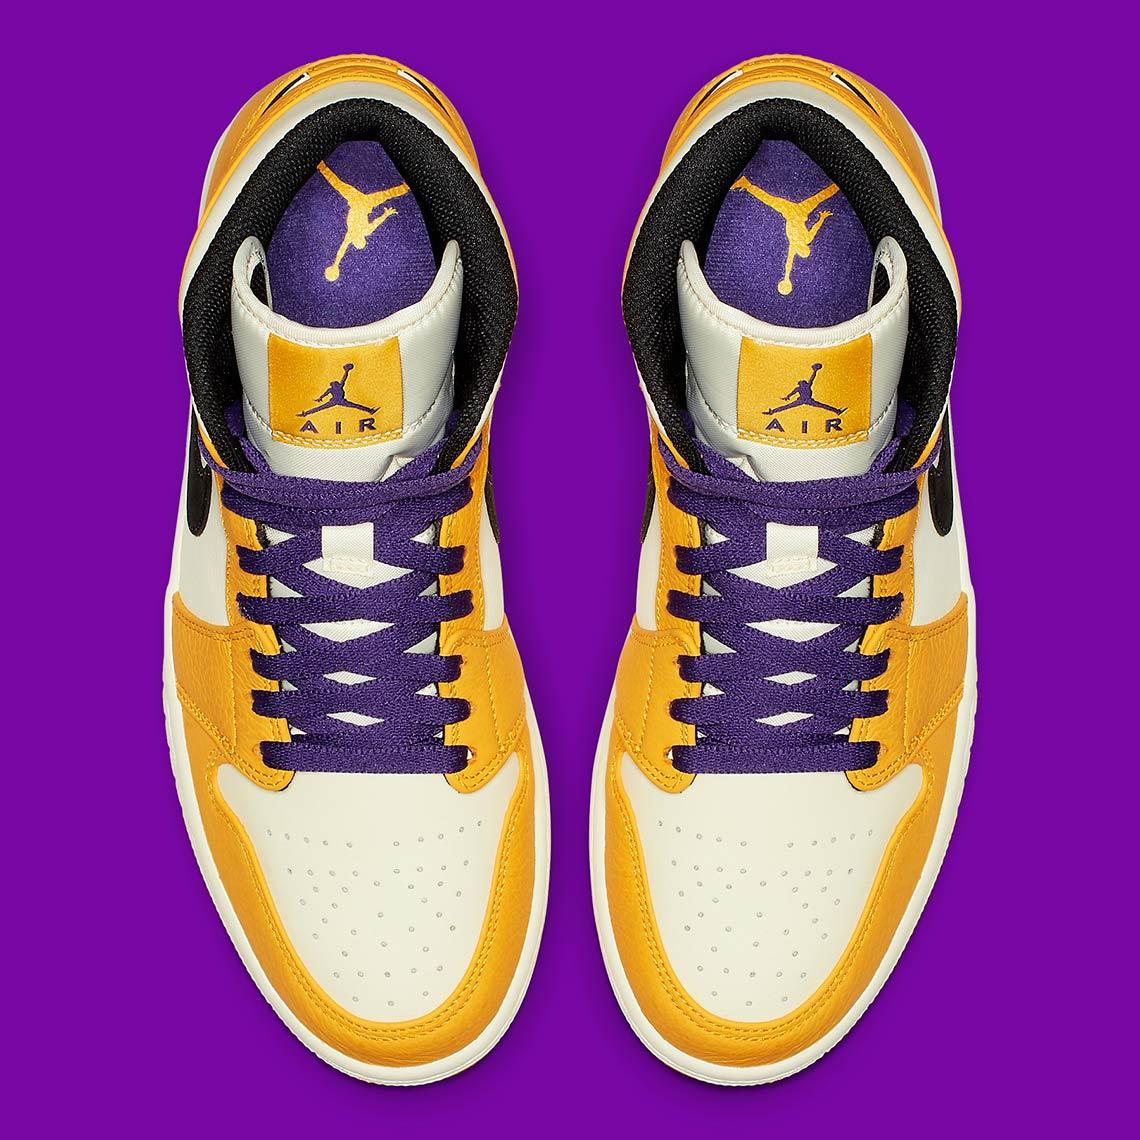 b6735425efd Jordan 1 Mid Lakers 852542-700 Release Info | SneakerNews.com